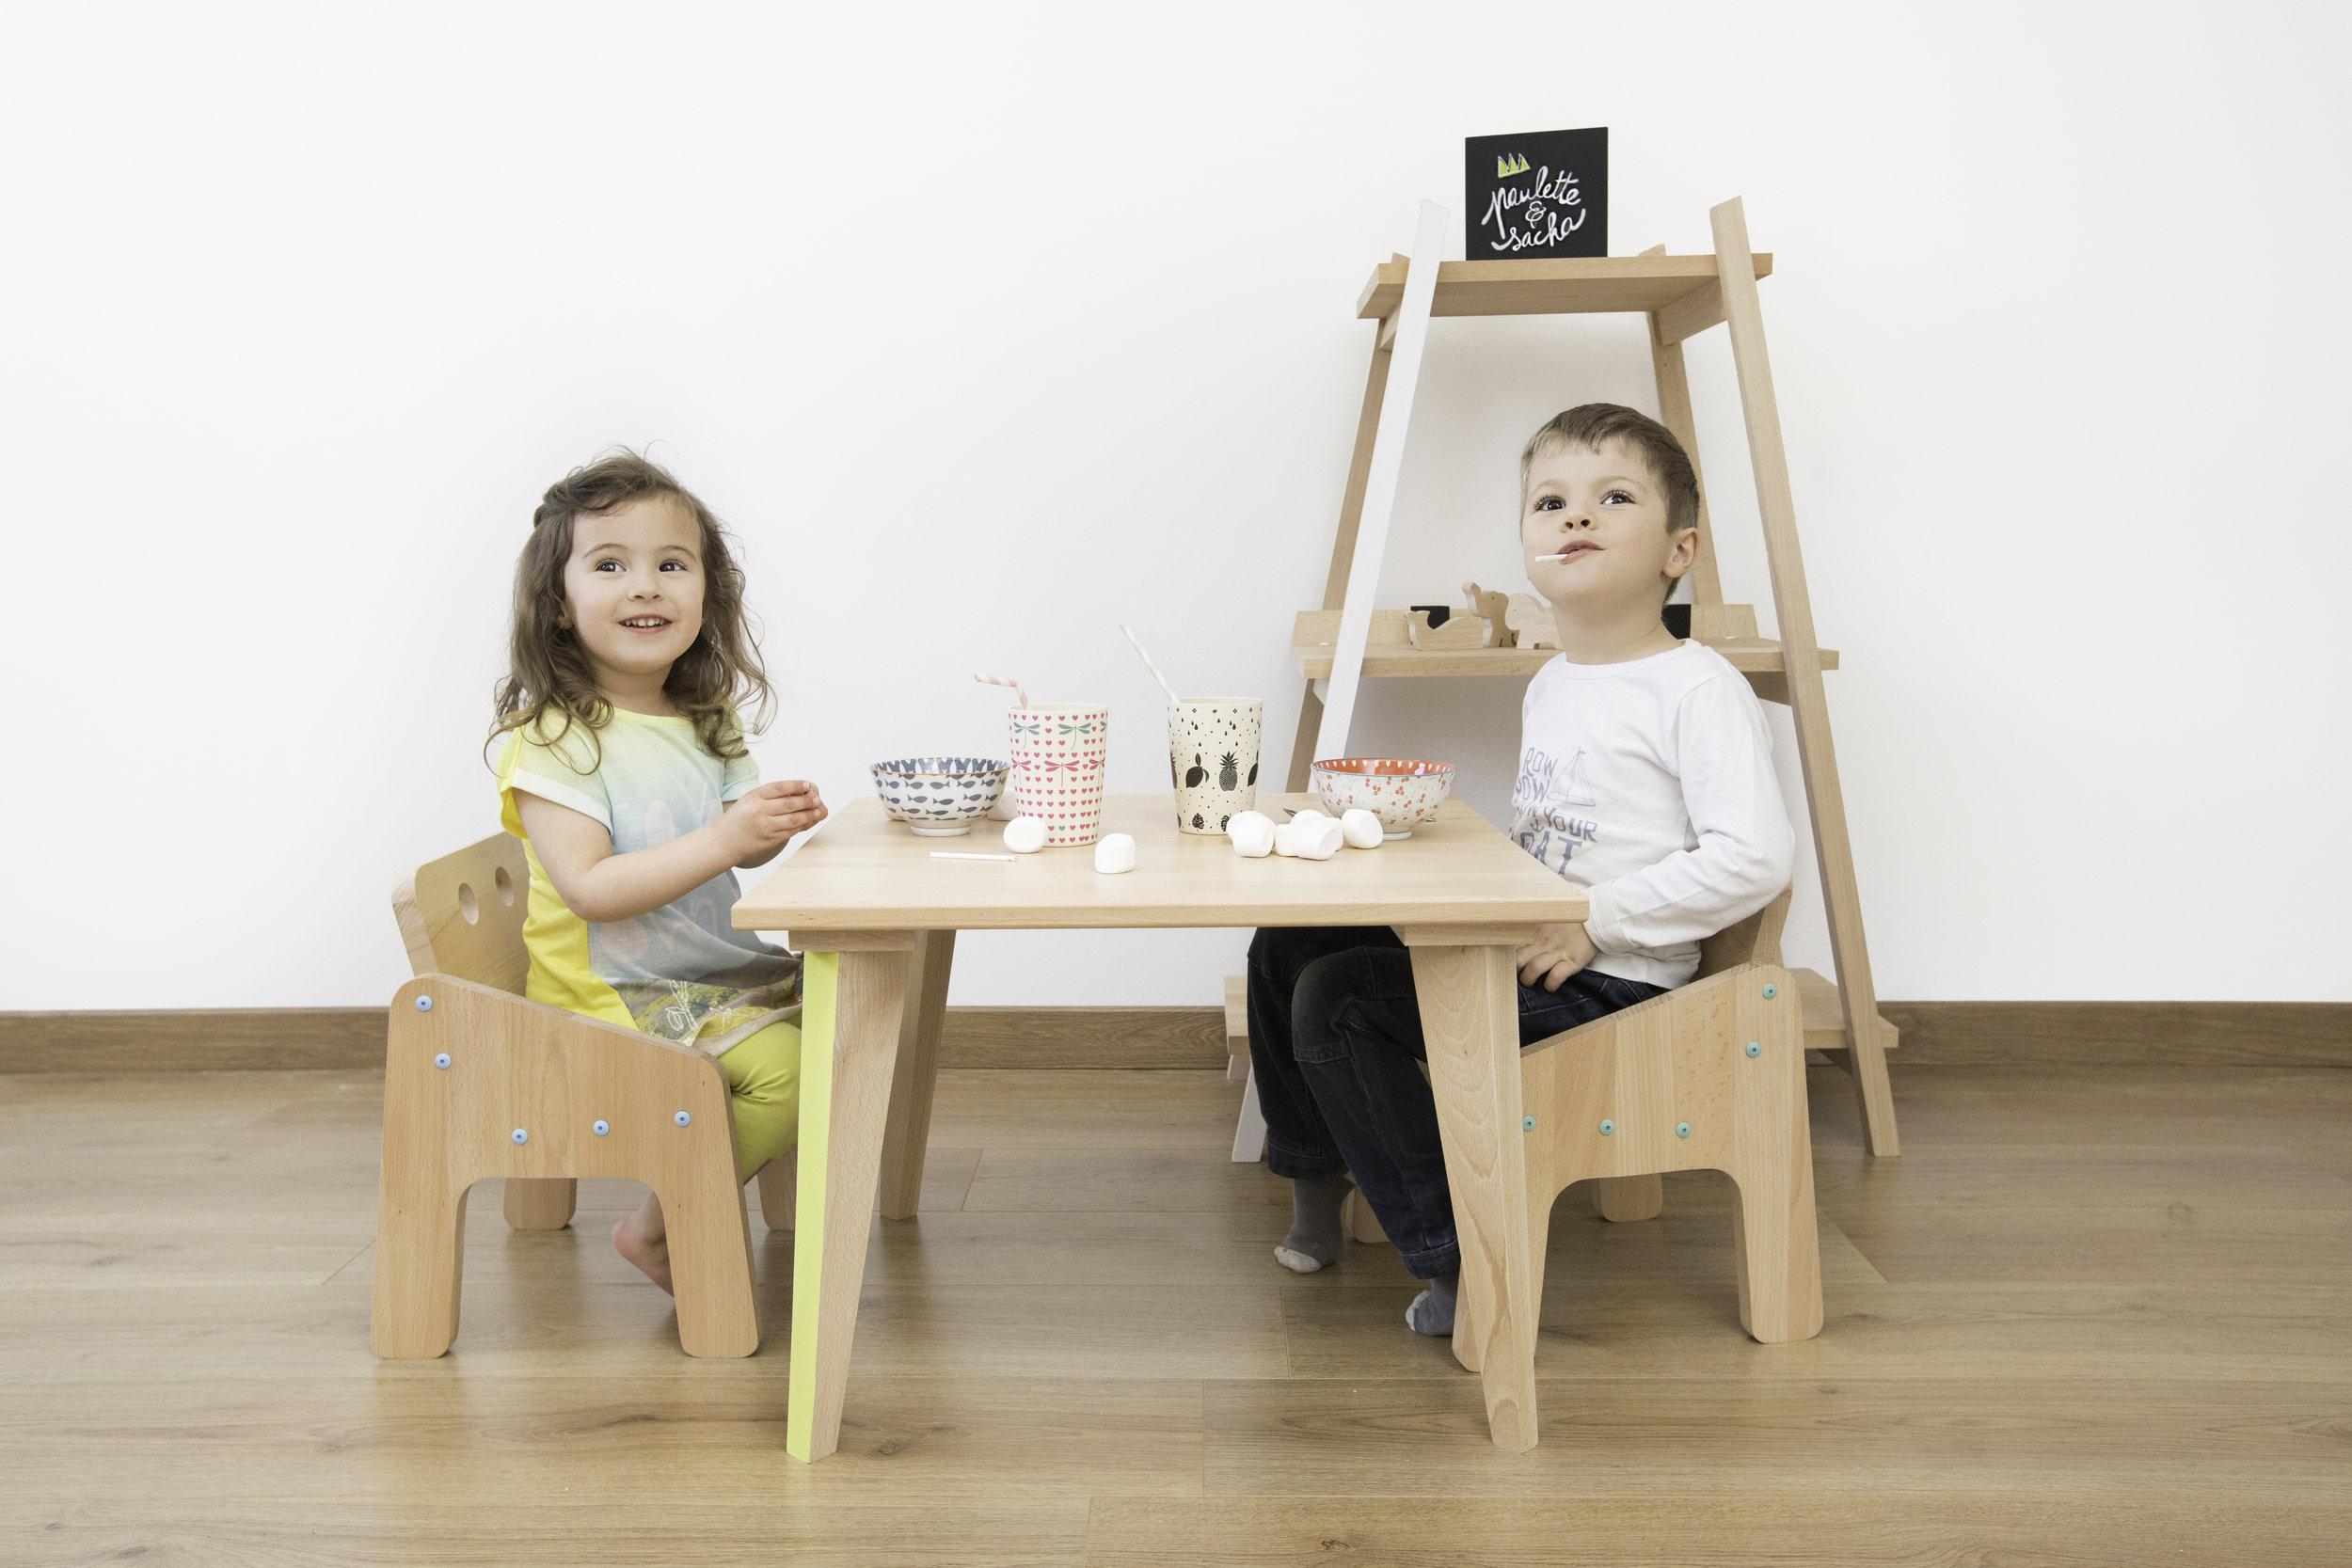 Table-basse-fauteuil-etagere-2-pauletteetsacha.jpg